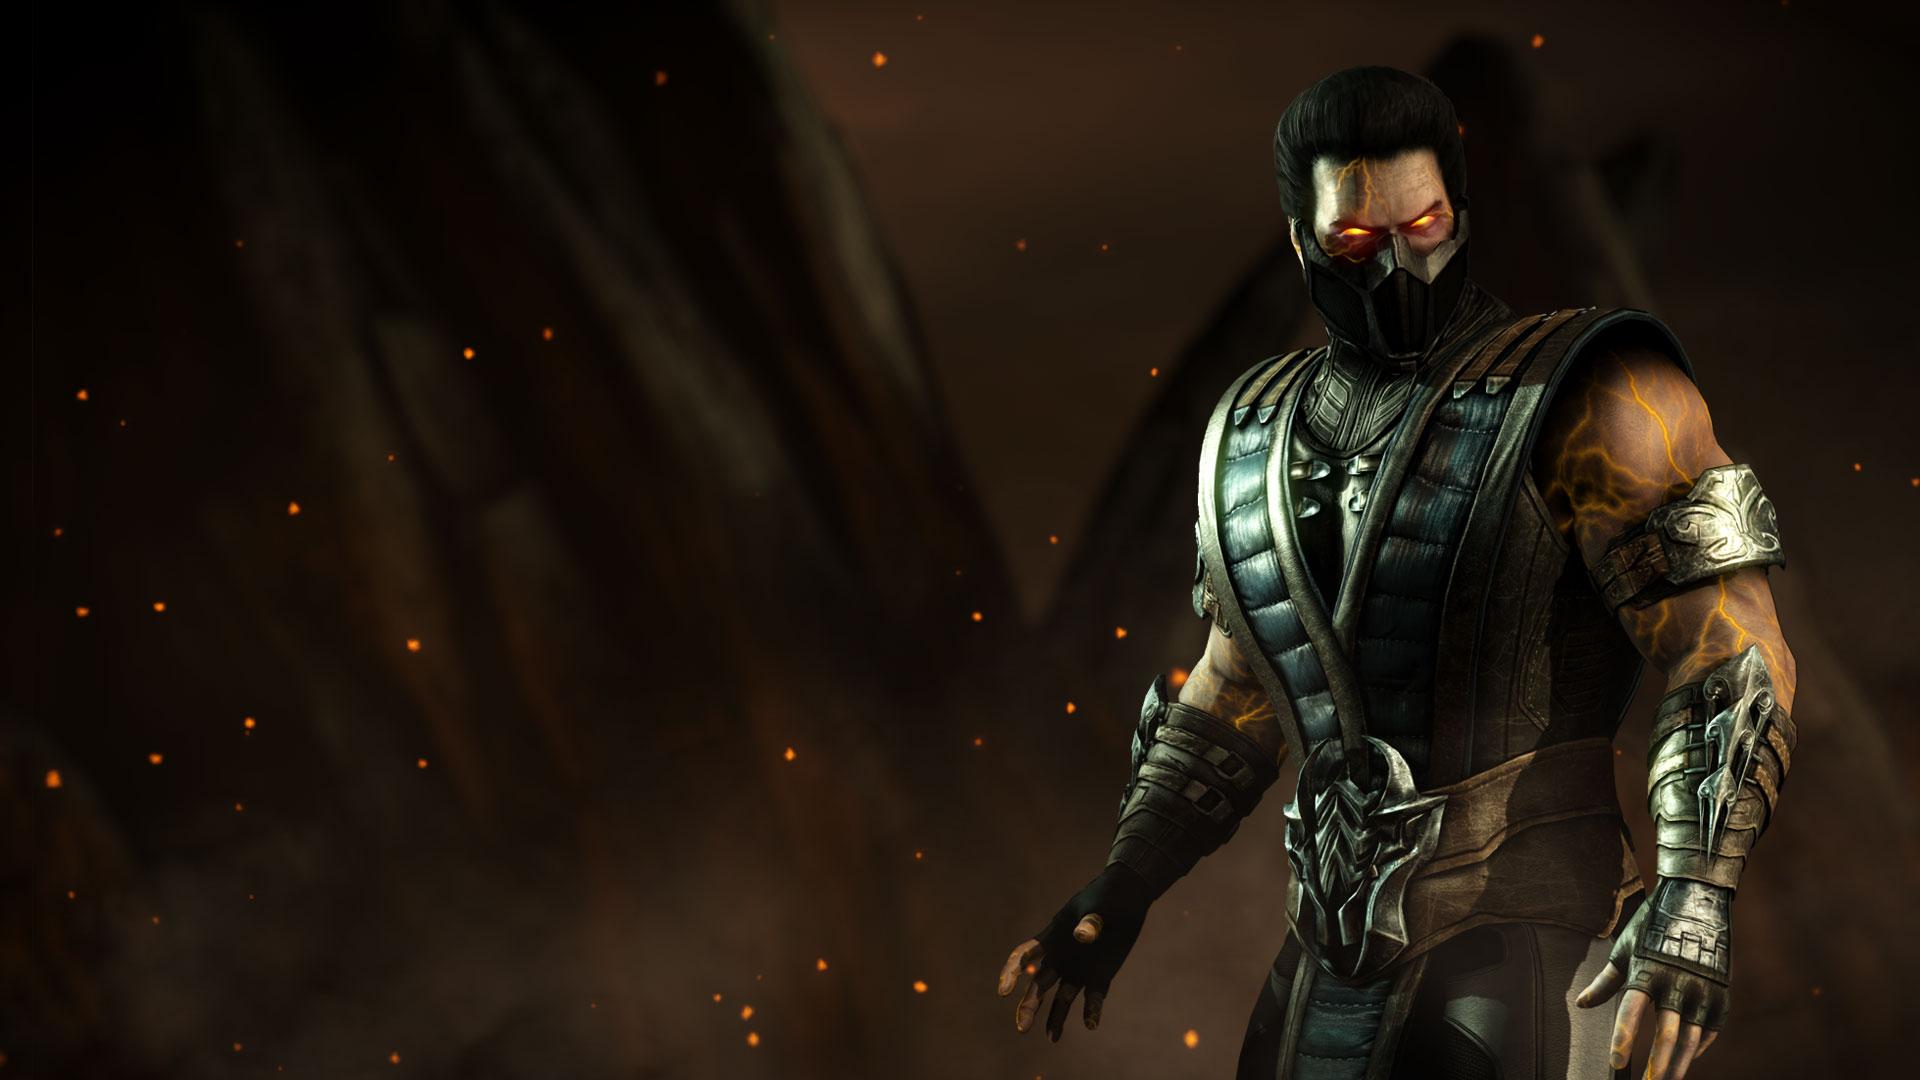 Live Wallpaper For Iphone X Mkwarehouse Mortal Kombat X Sub Zero